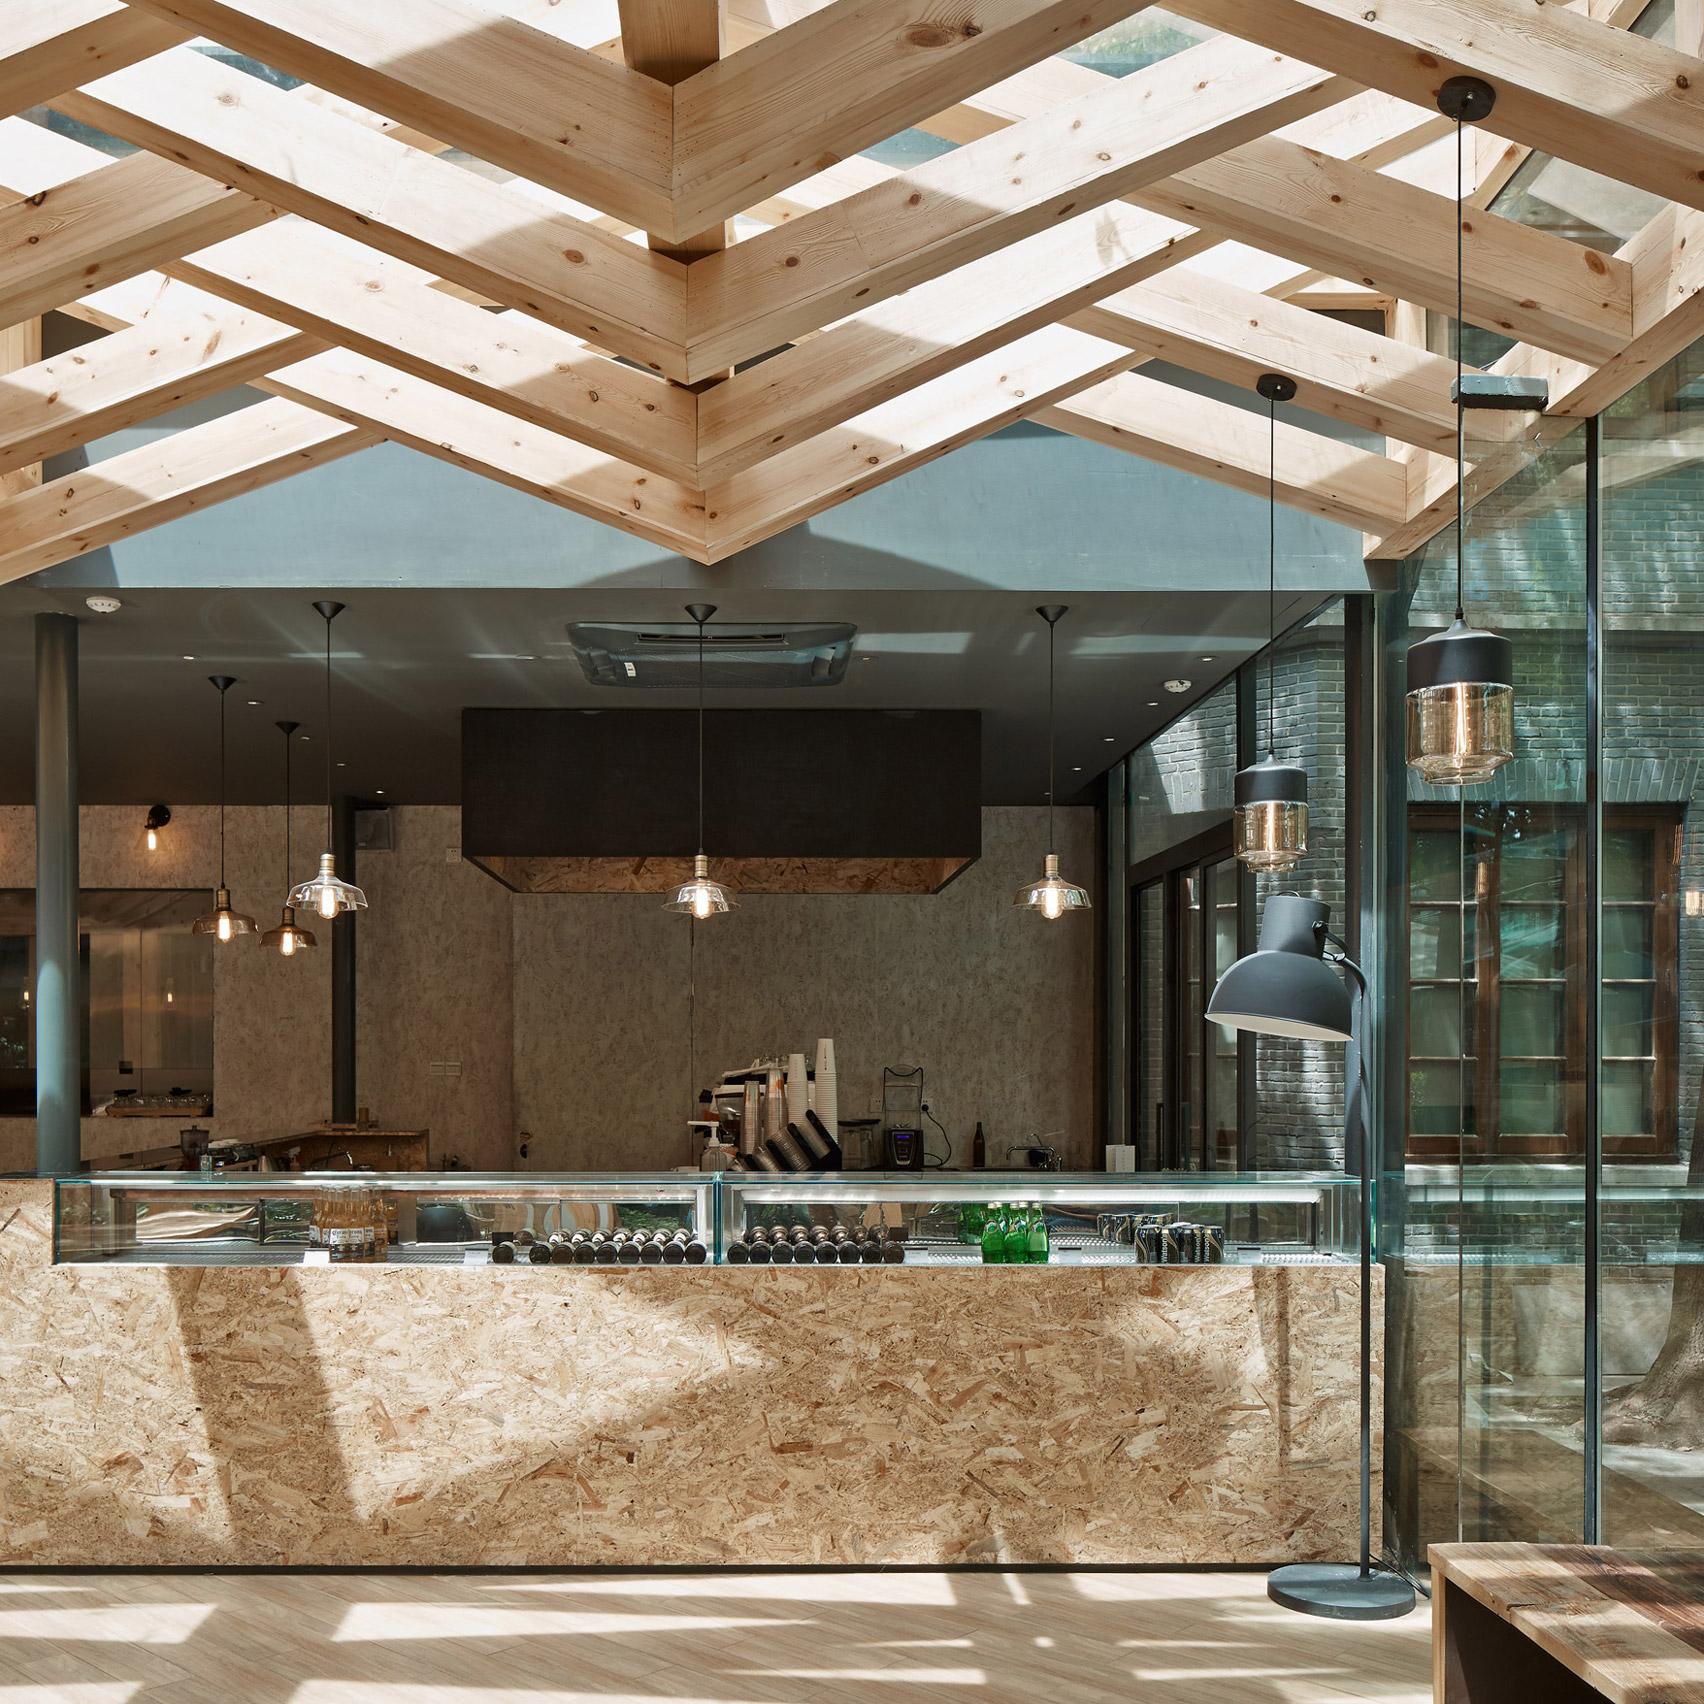 Xie Xie Cafe (Ханчжоу, Китай) by Kooo Architects